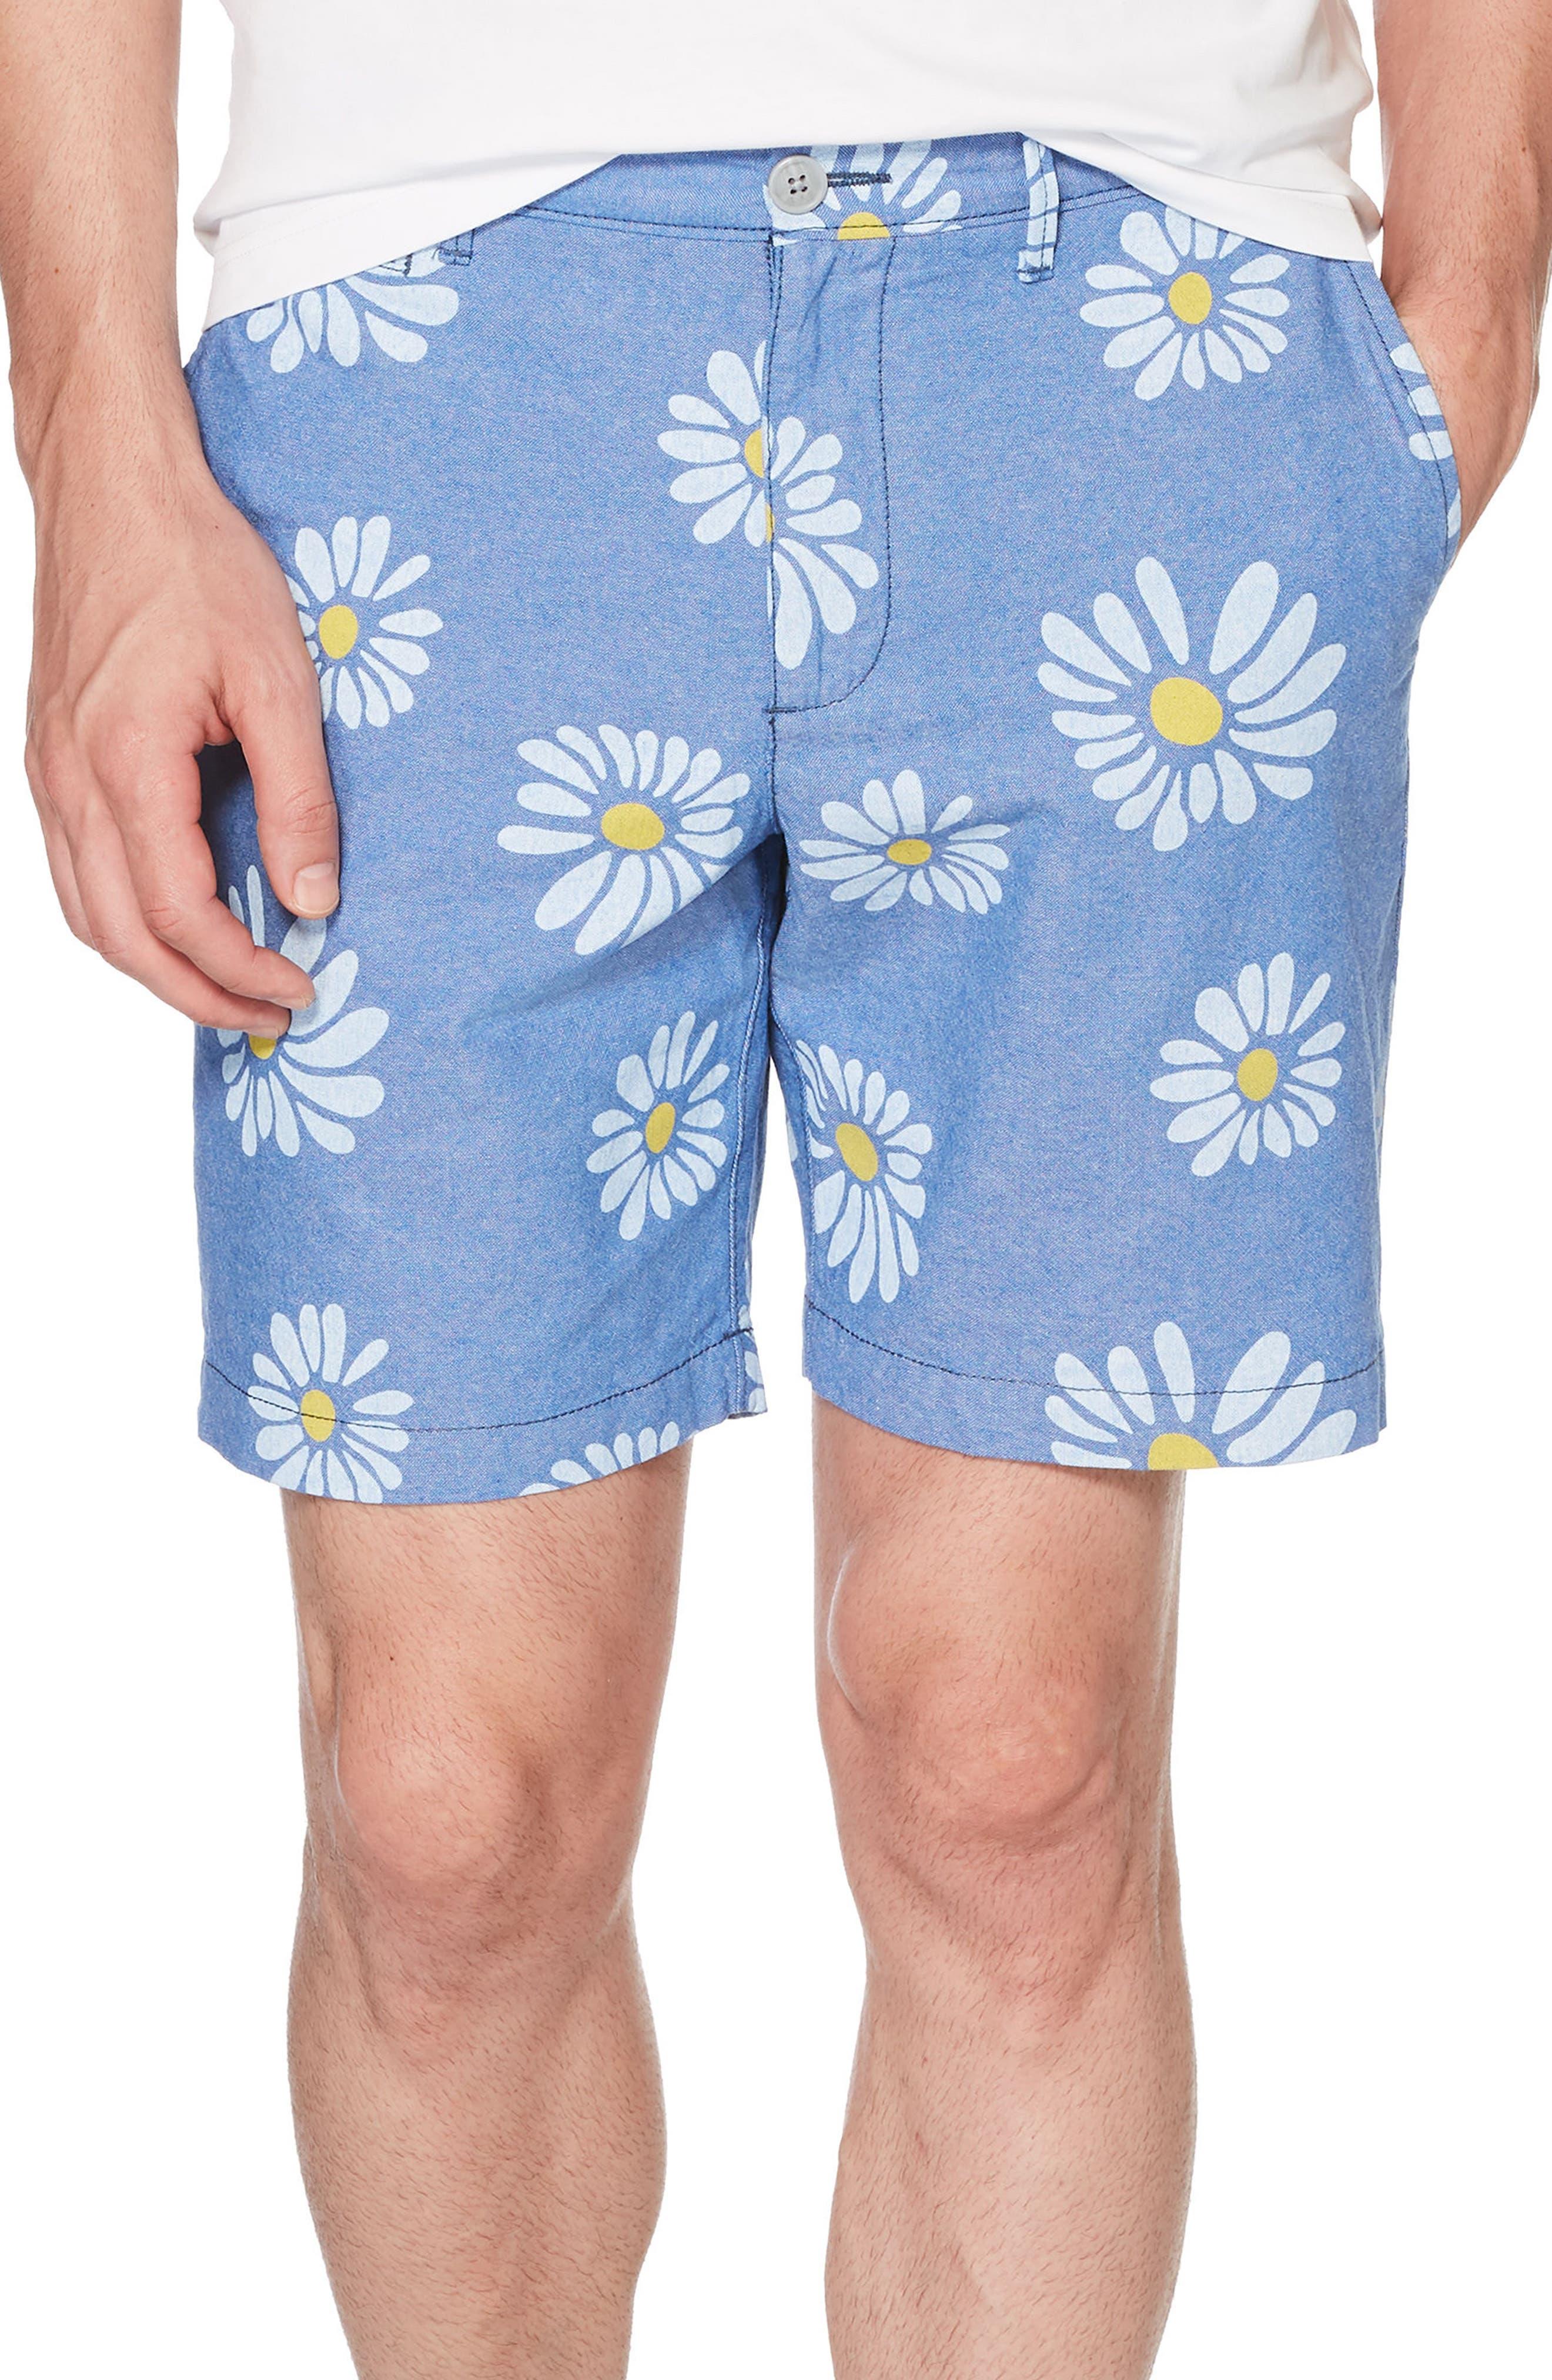 P55 Exploded Daisy Print Oxford Shorts,                             Main thumbnail 1, color,                             Turkish Sea